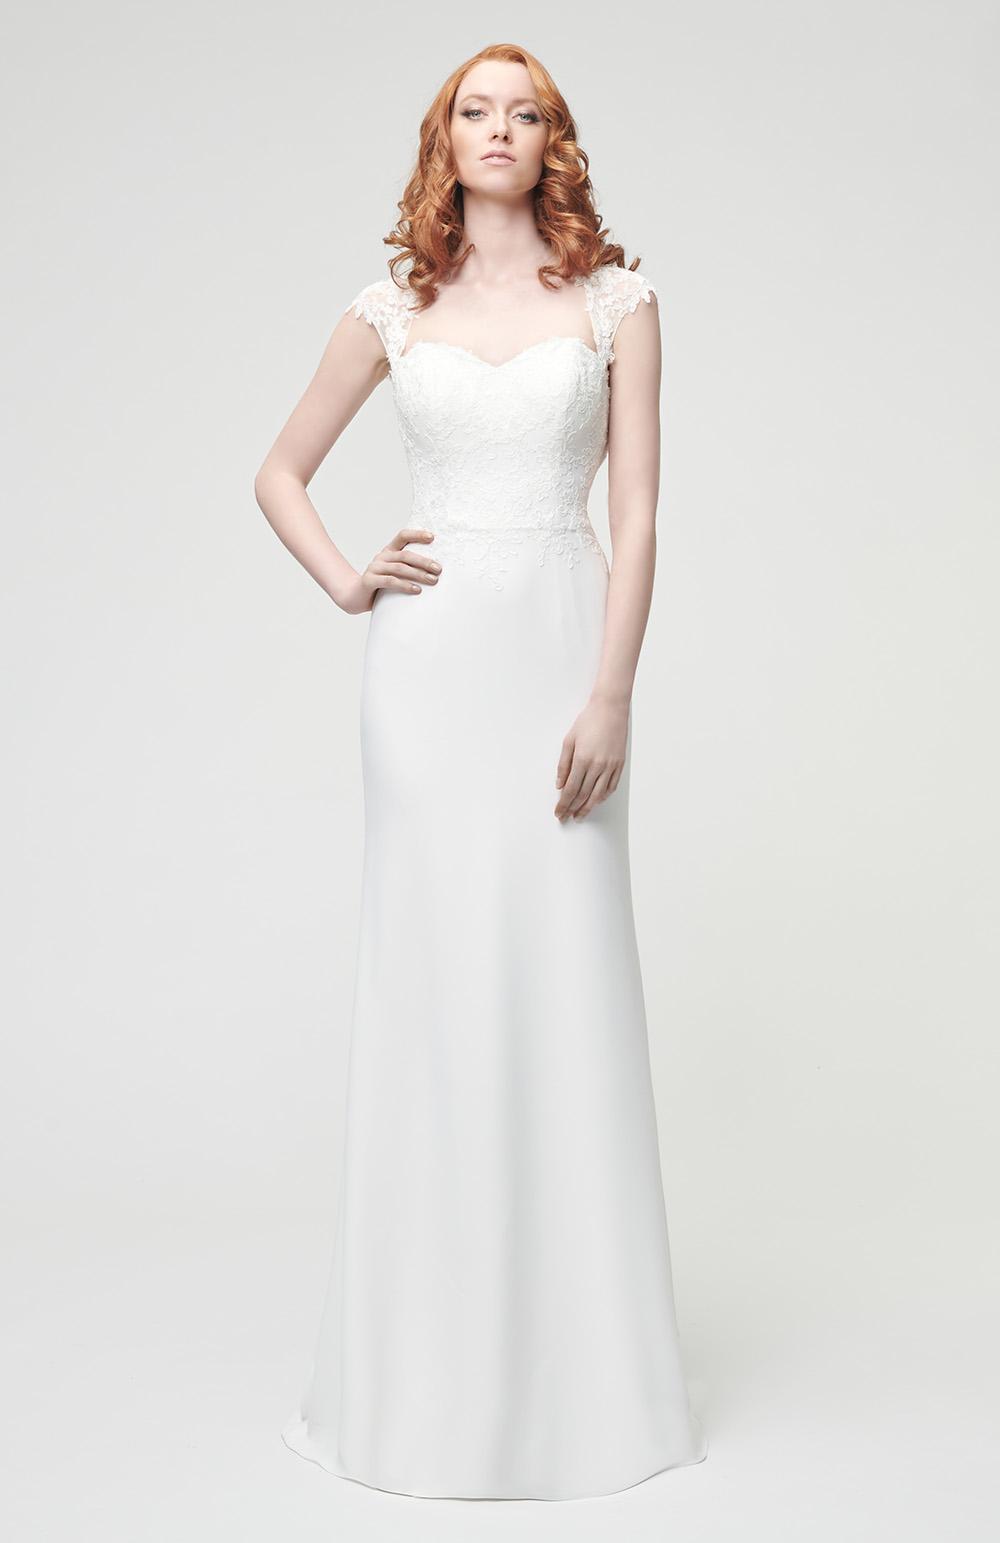 Robe de mariée Modèle Ombeline